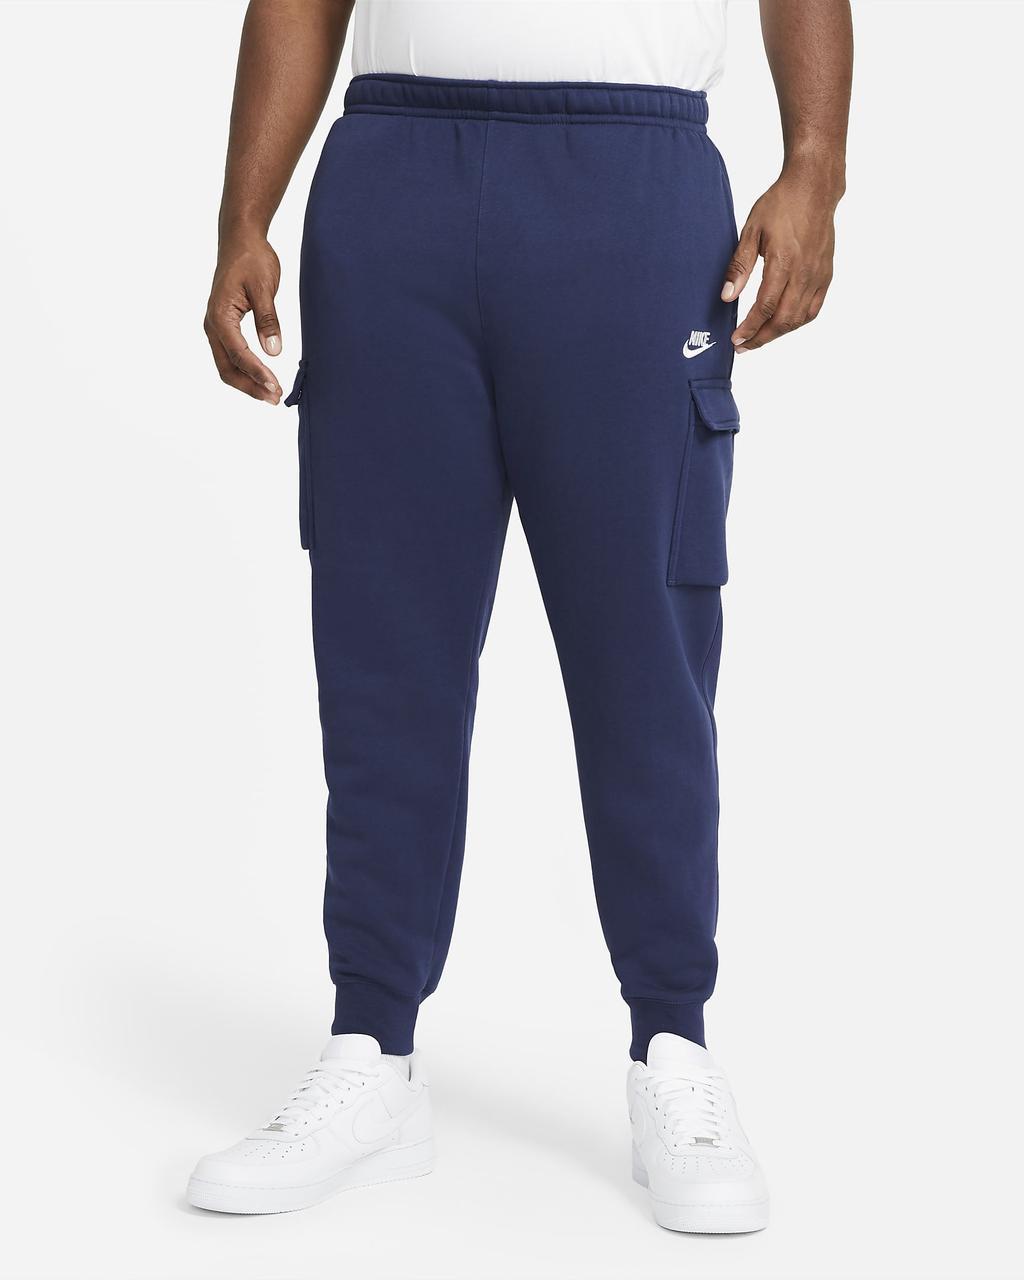 Штаны спортивные мужские Nike Sportswear Club Fleece CD3129-410 Темно-синий